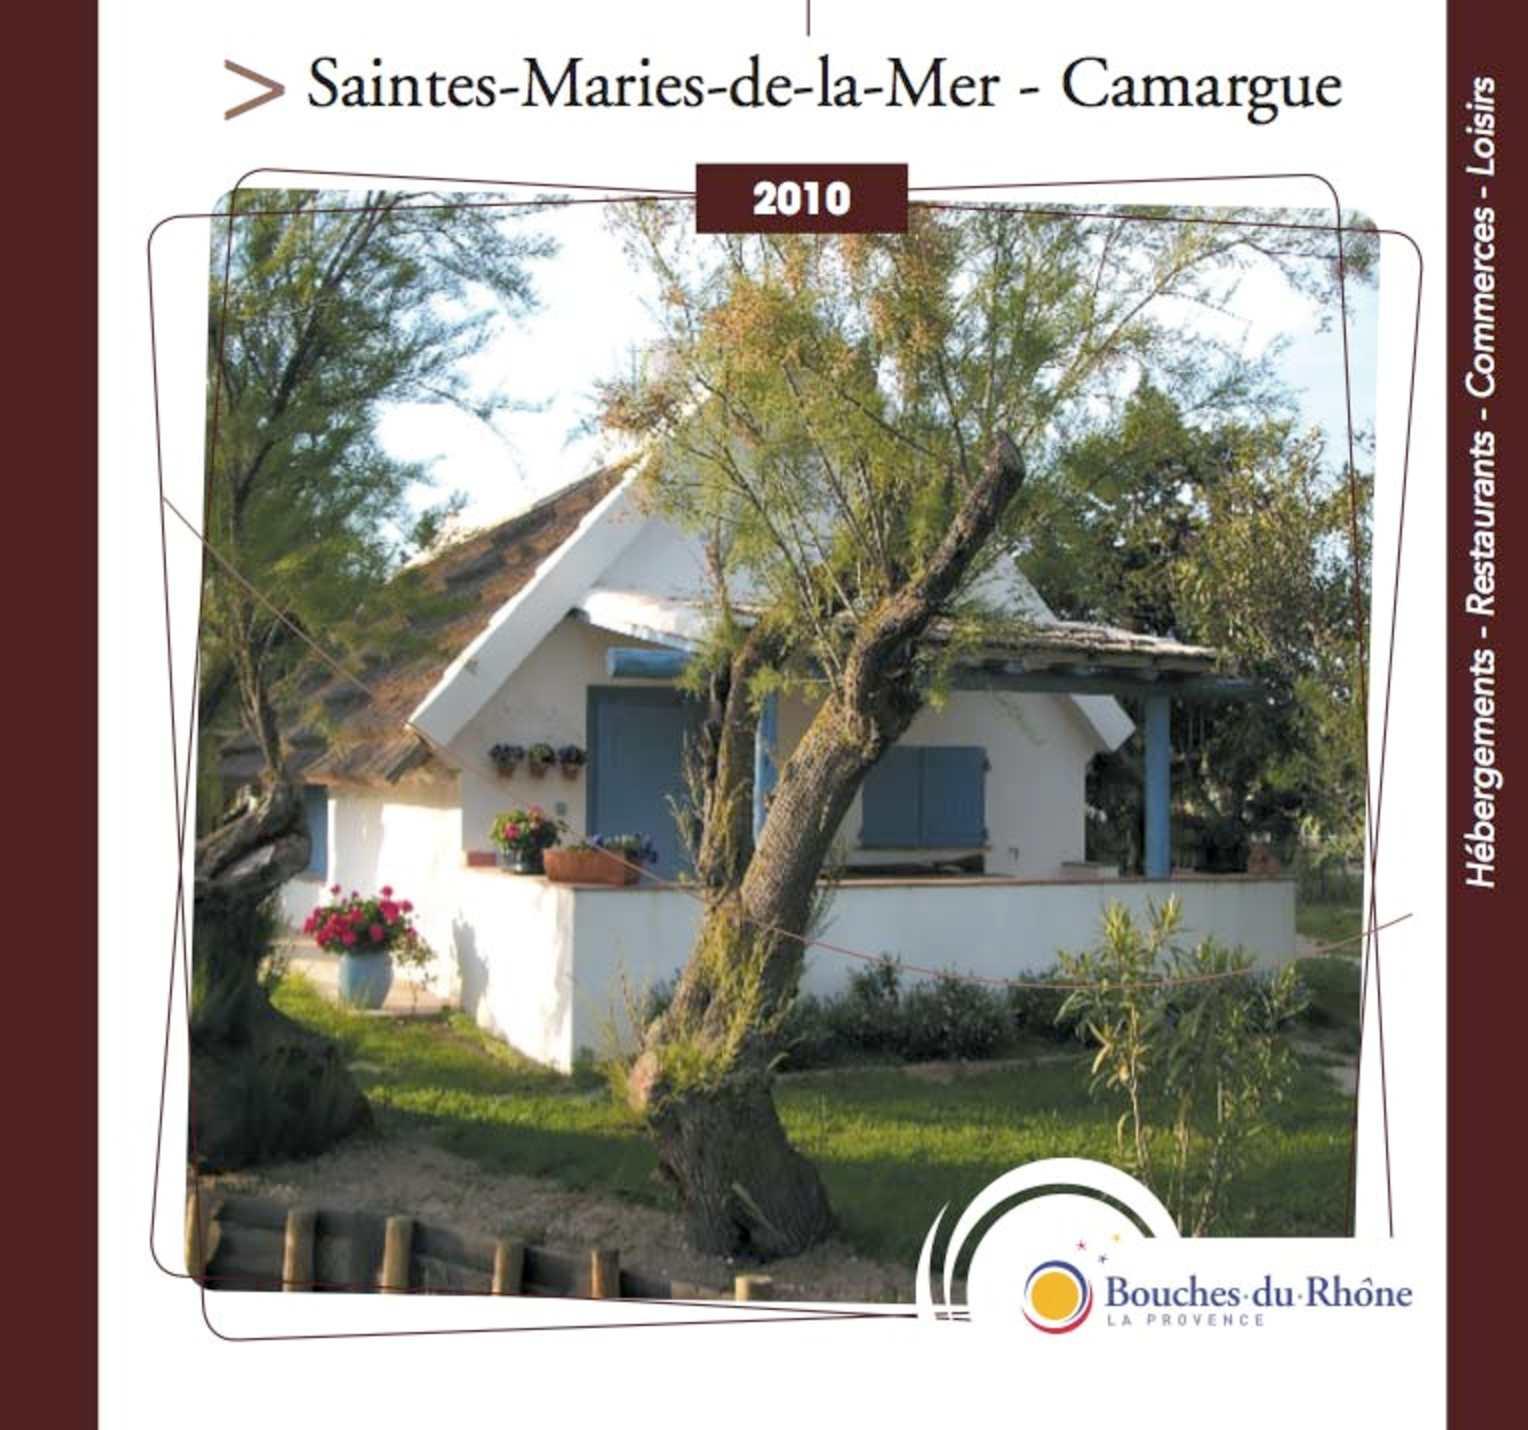 Calam O Camargue Saintes Maries De La Mer Guide Des